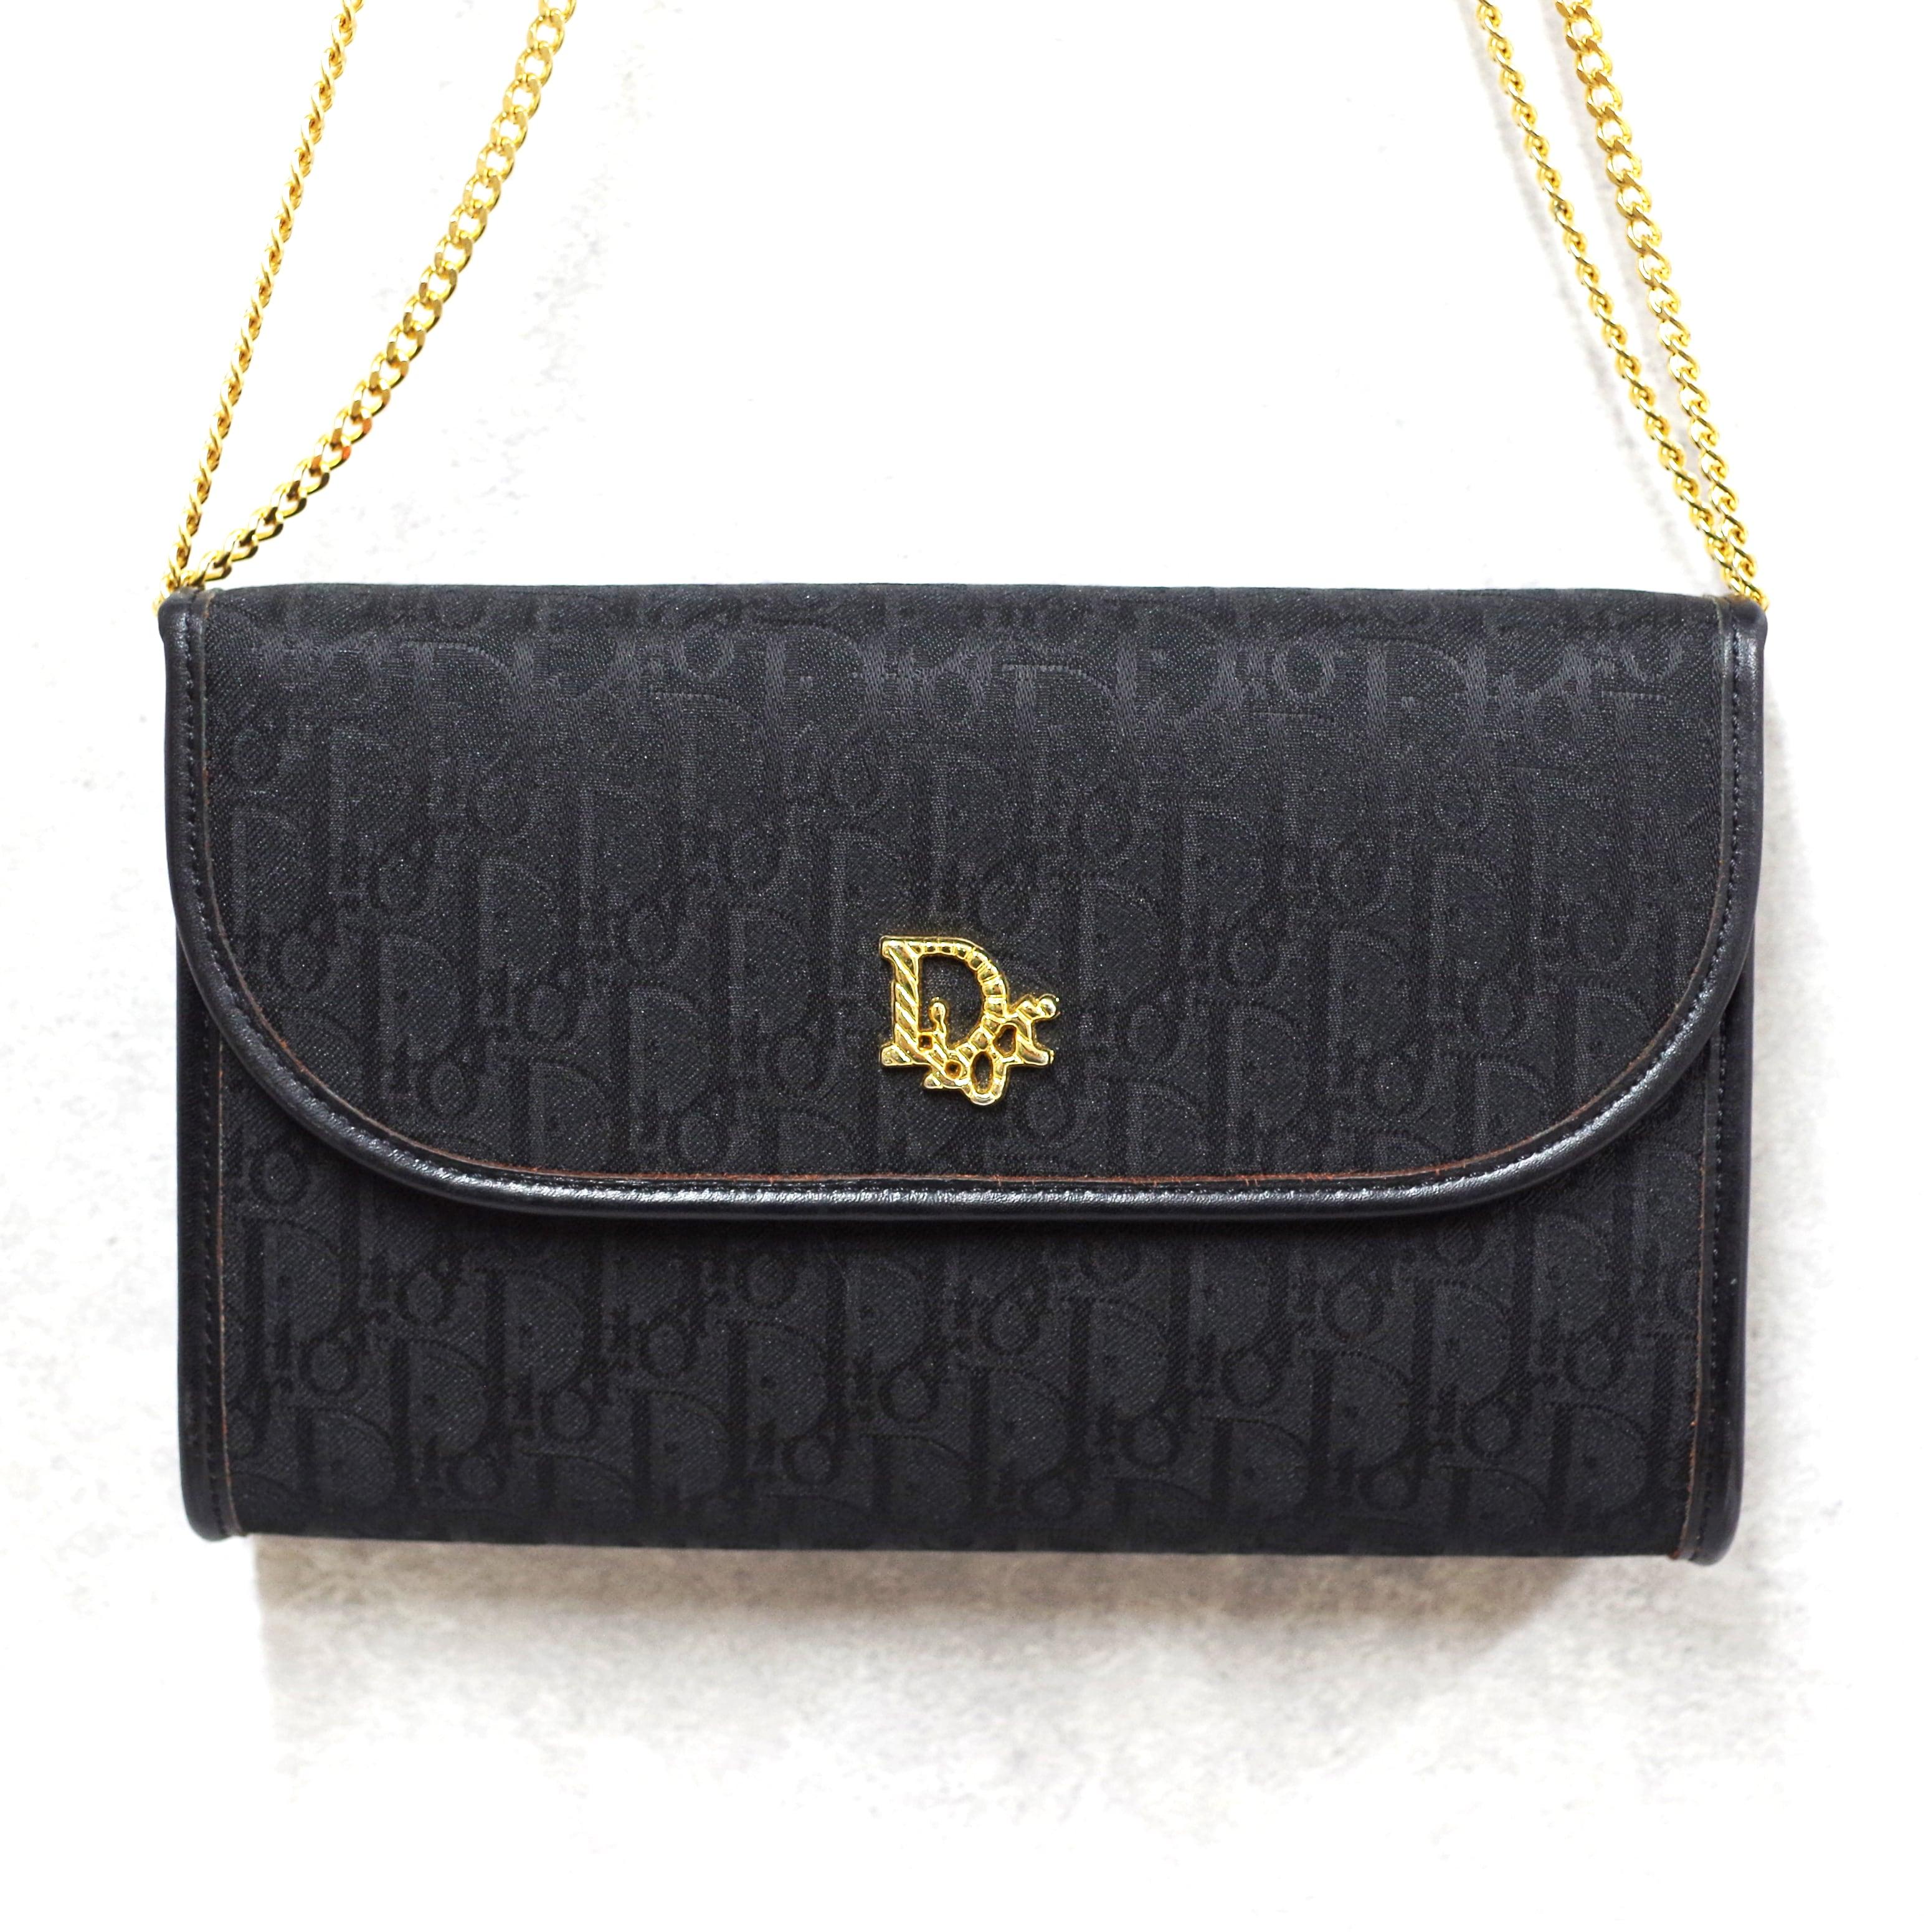 Christian Dior ディオール チェーンショルダーバッグ ブラック